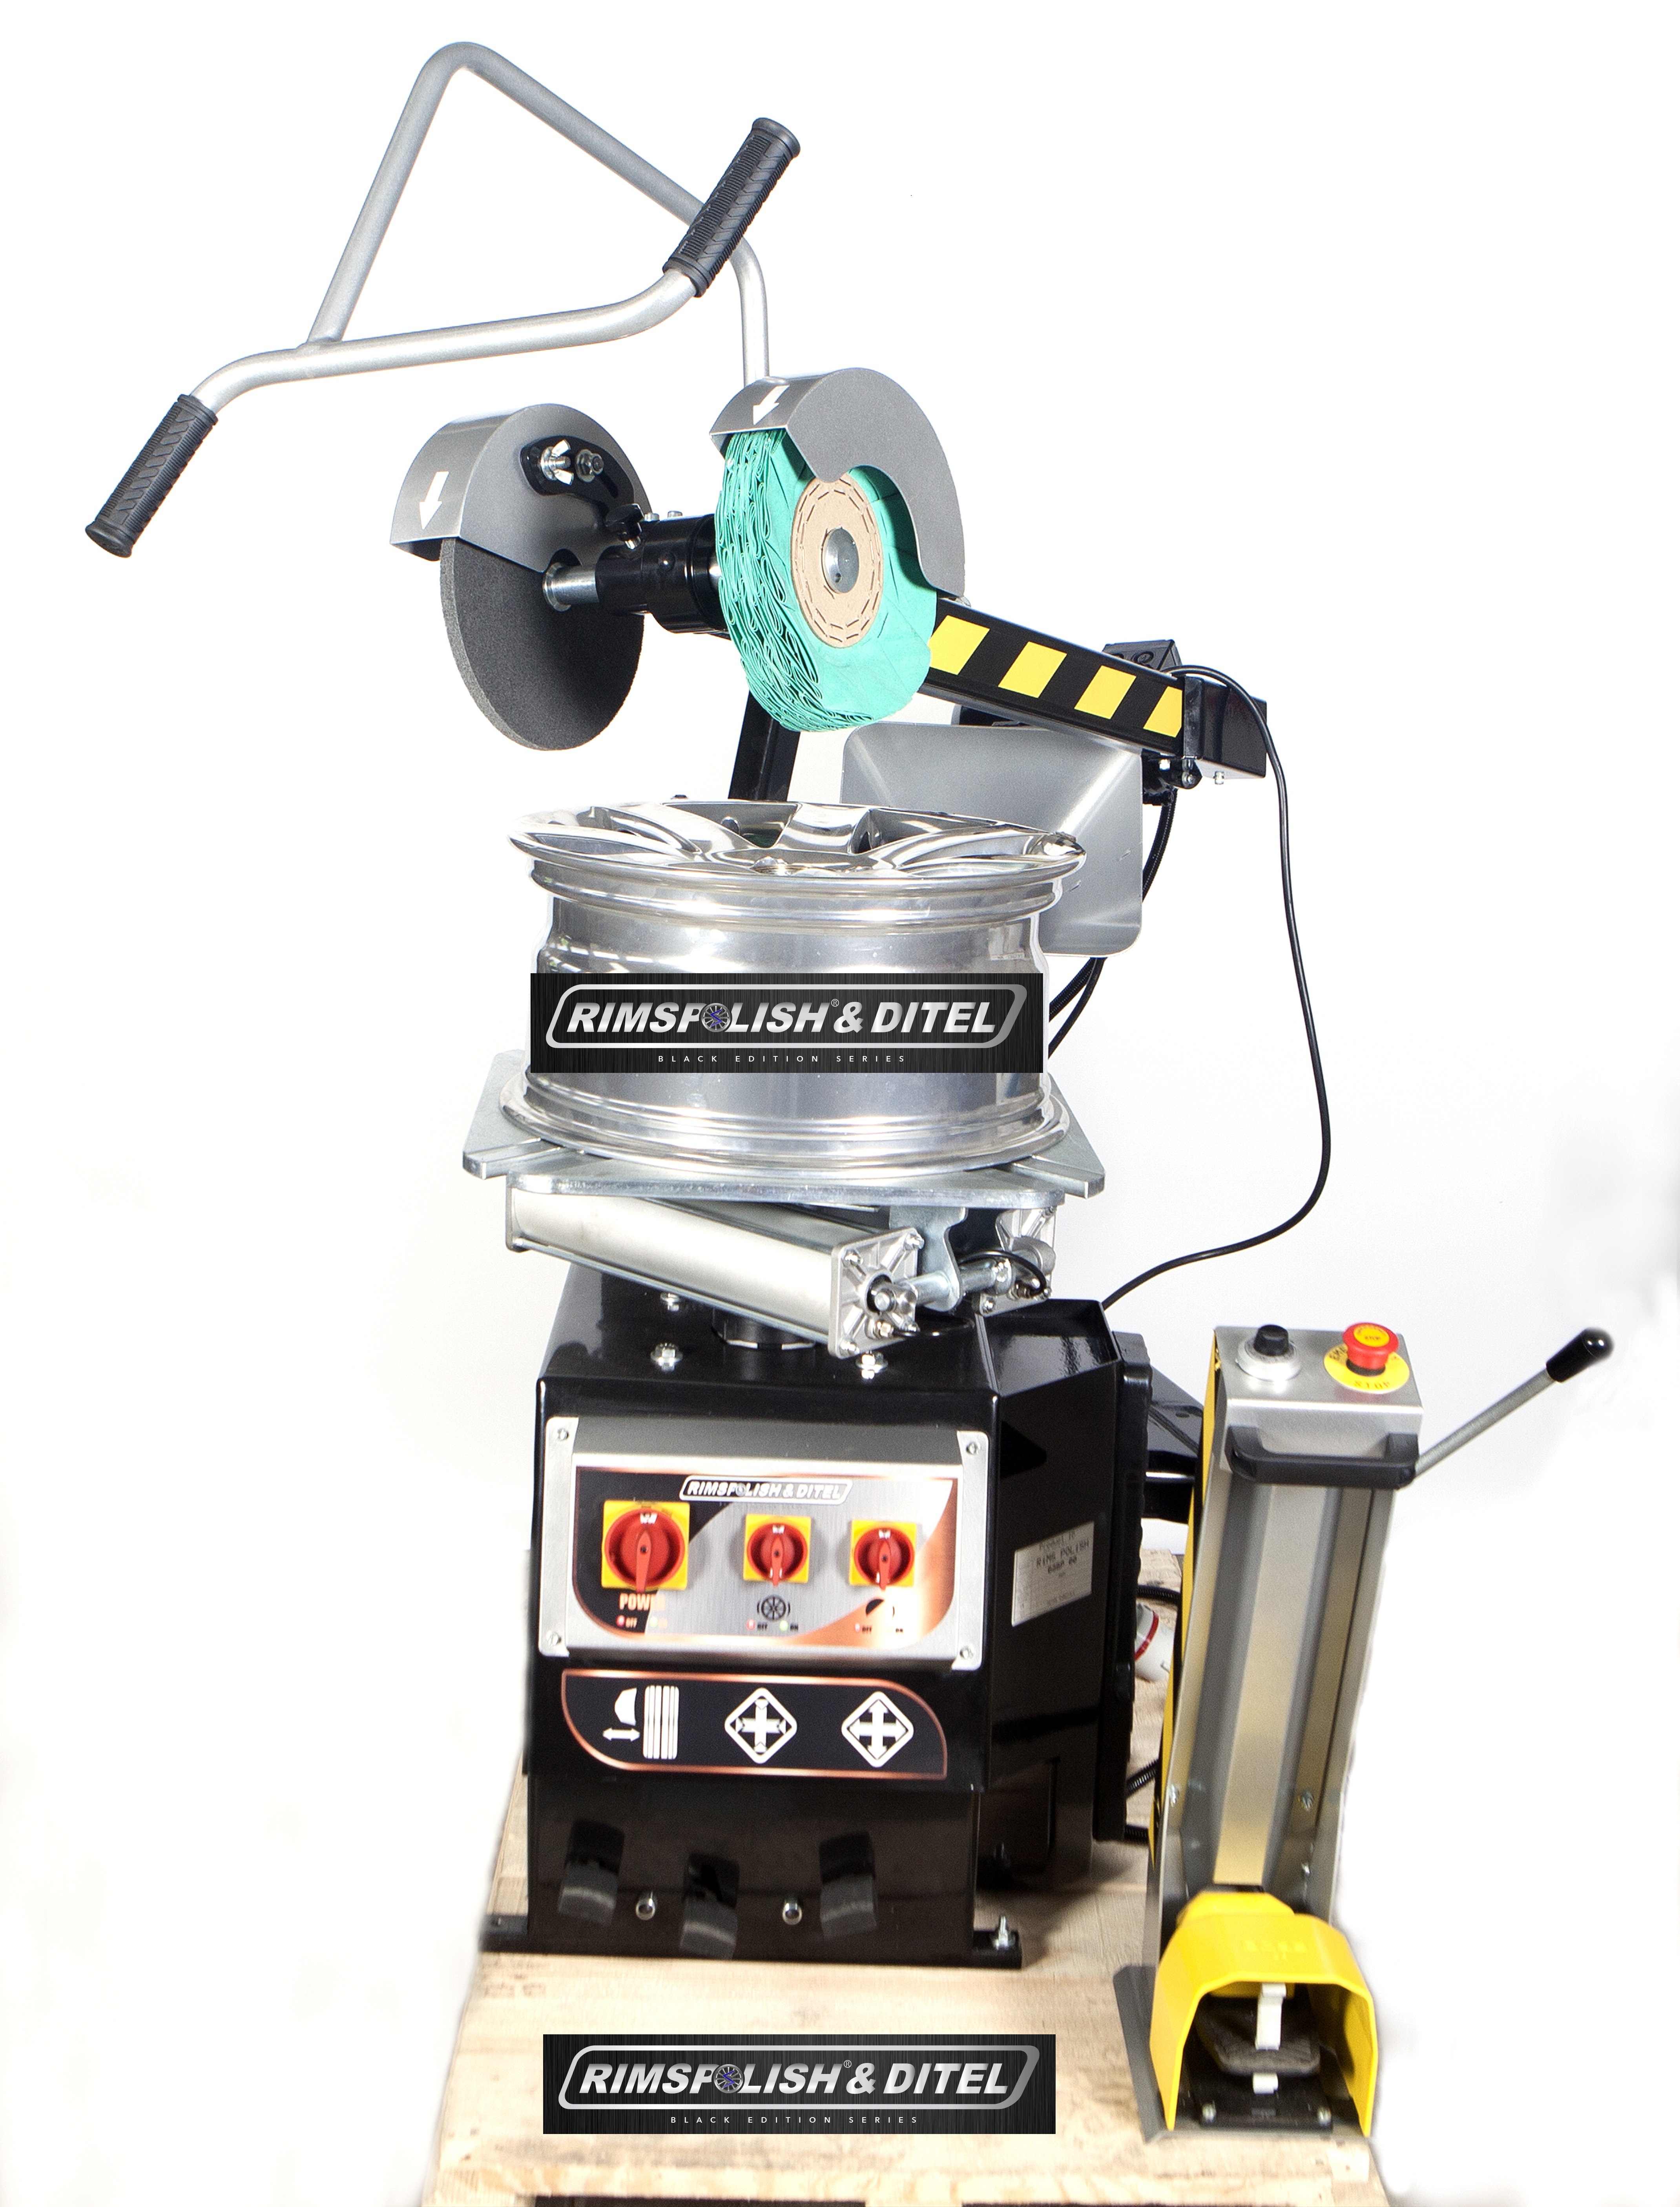 Felgenpoliermaschine RIMSPOLISH C32 BLACK-EDITION NEW 2019